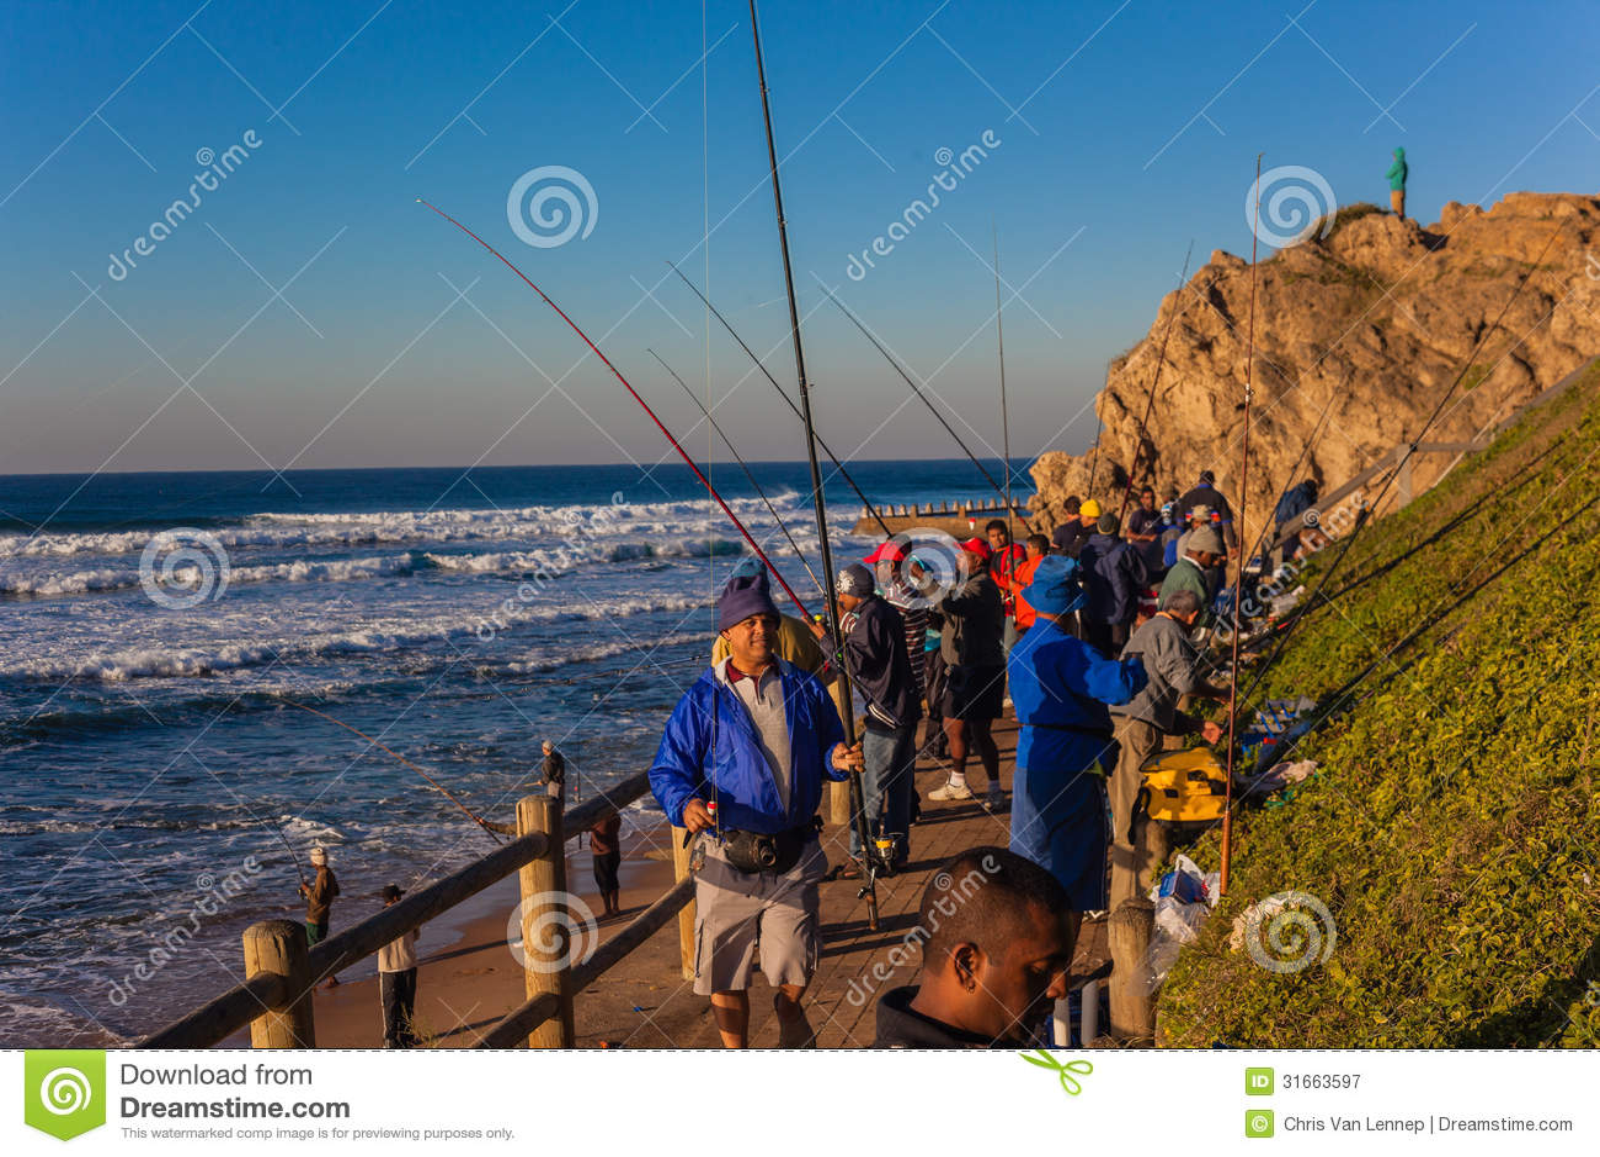 Fishermen season sunrise sea editorial photography image for Fishing high tide